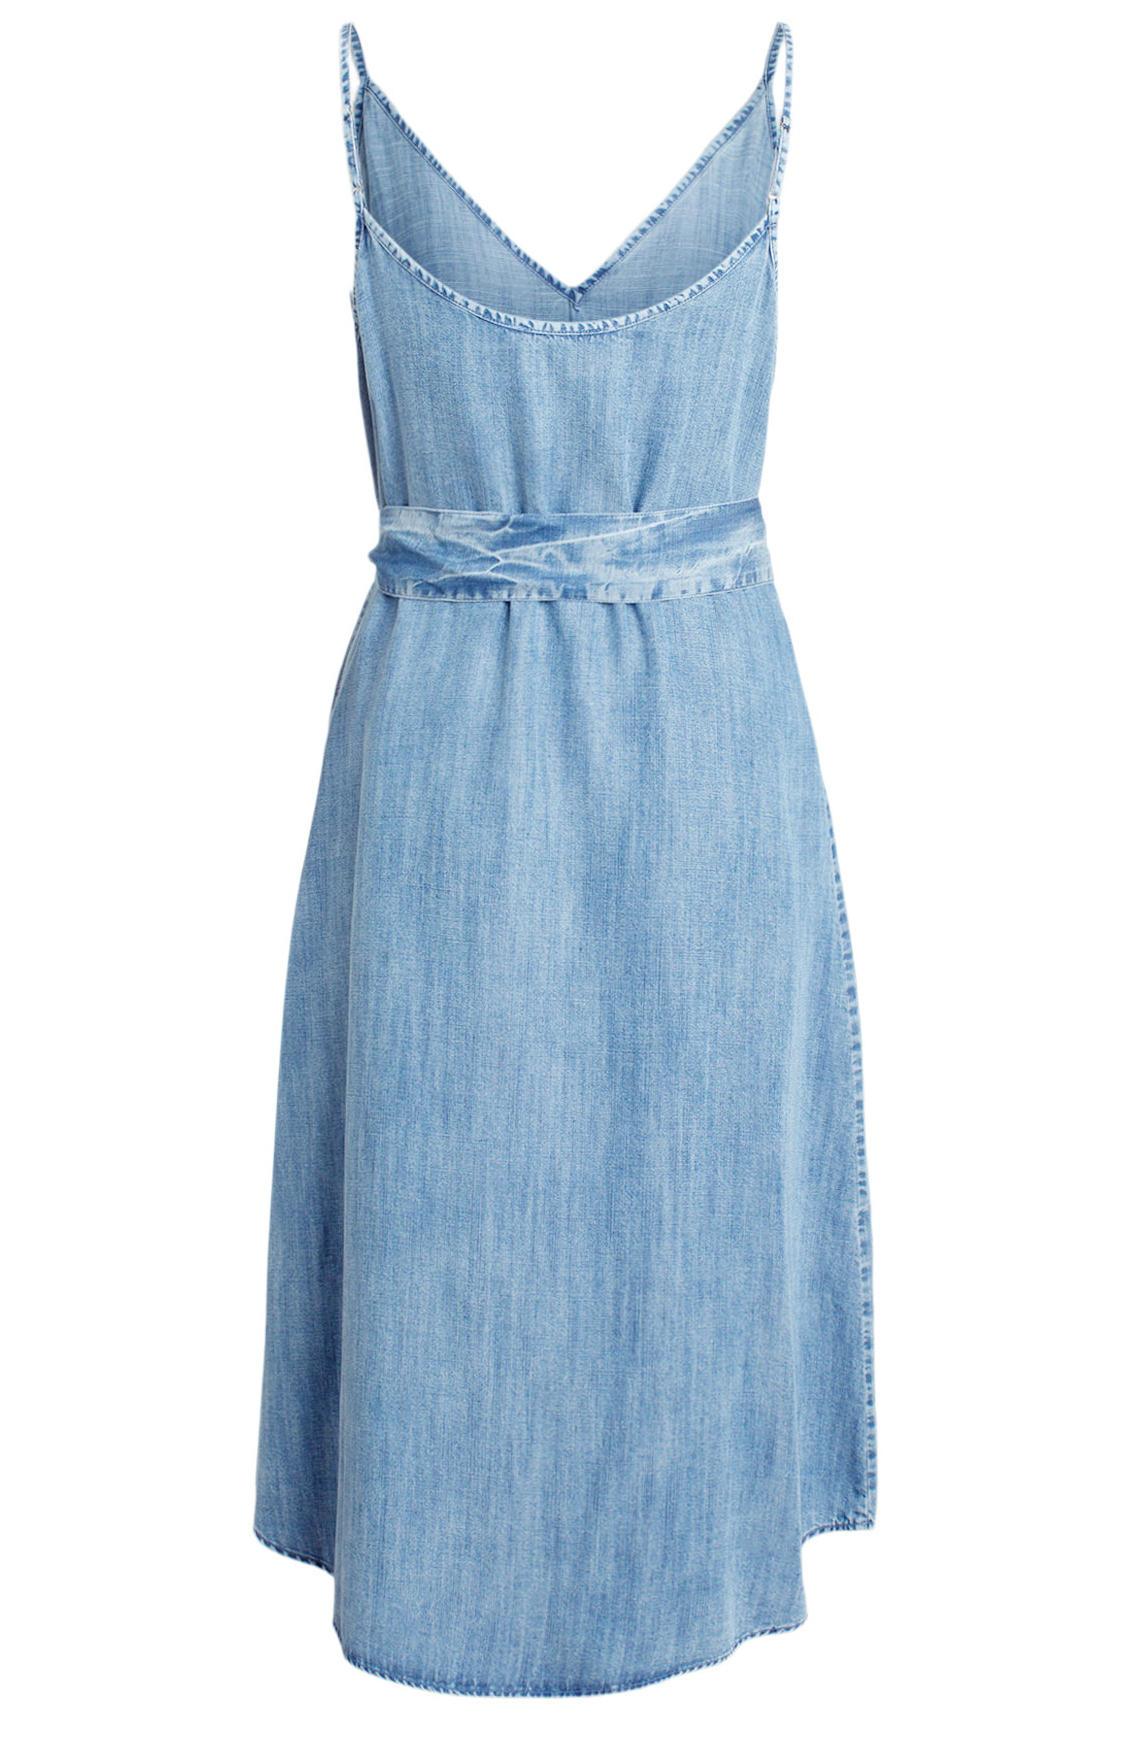 Moscow Dames Denim dress Blauw